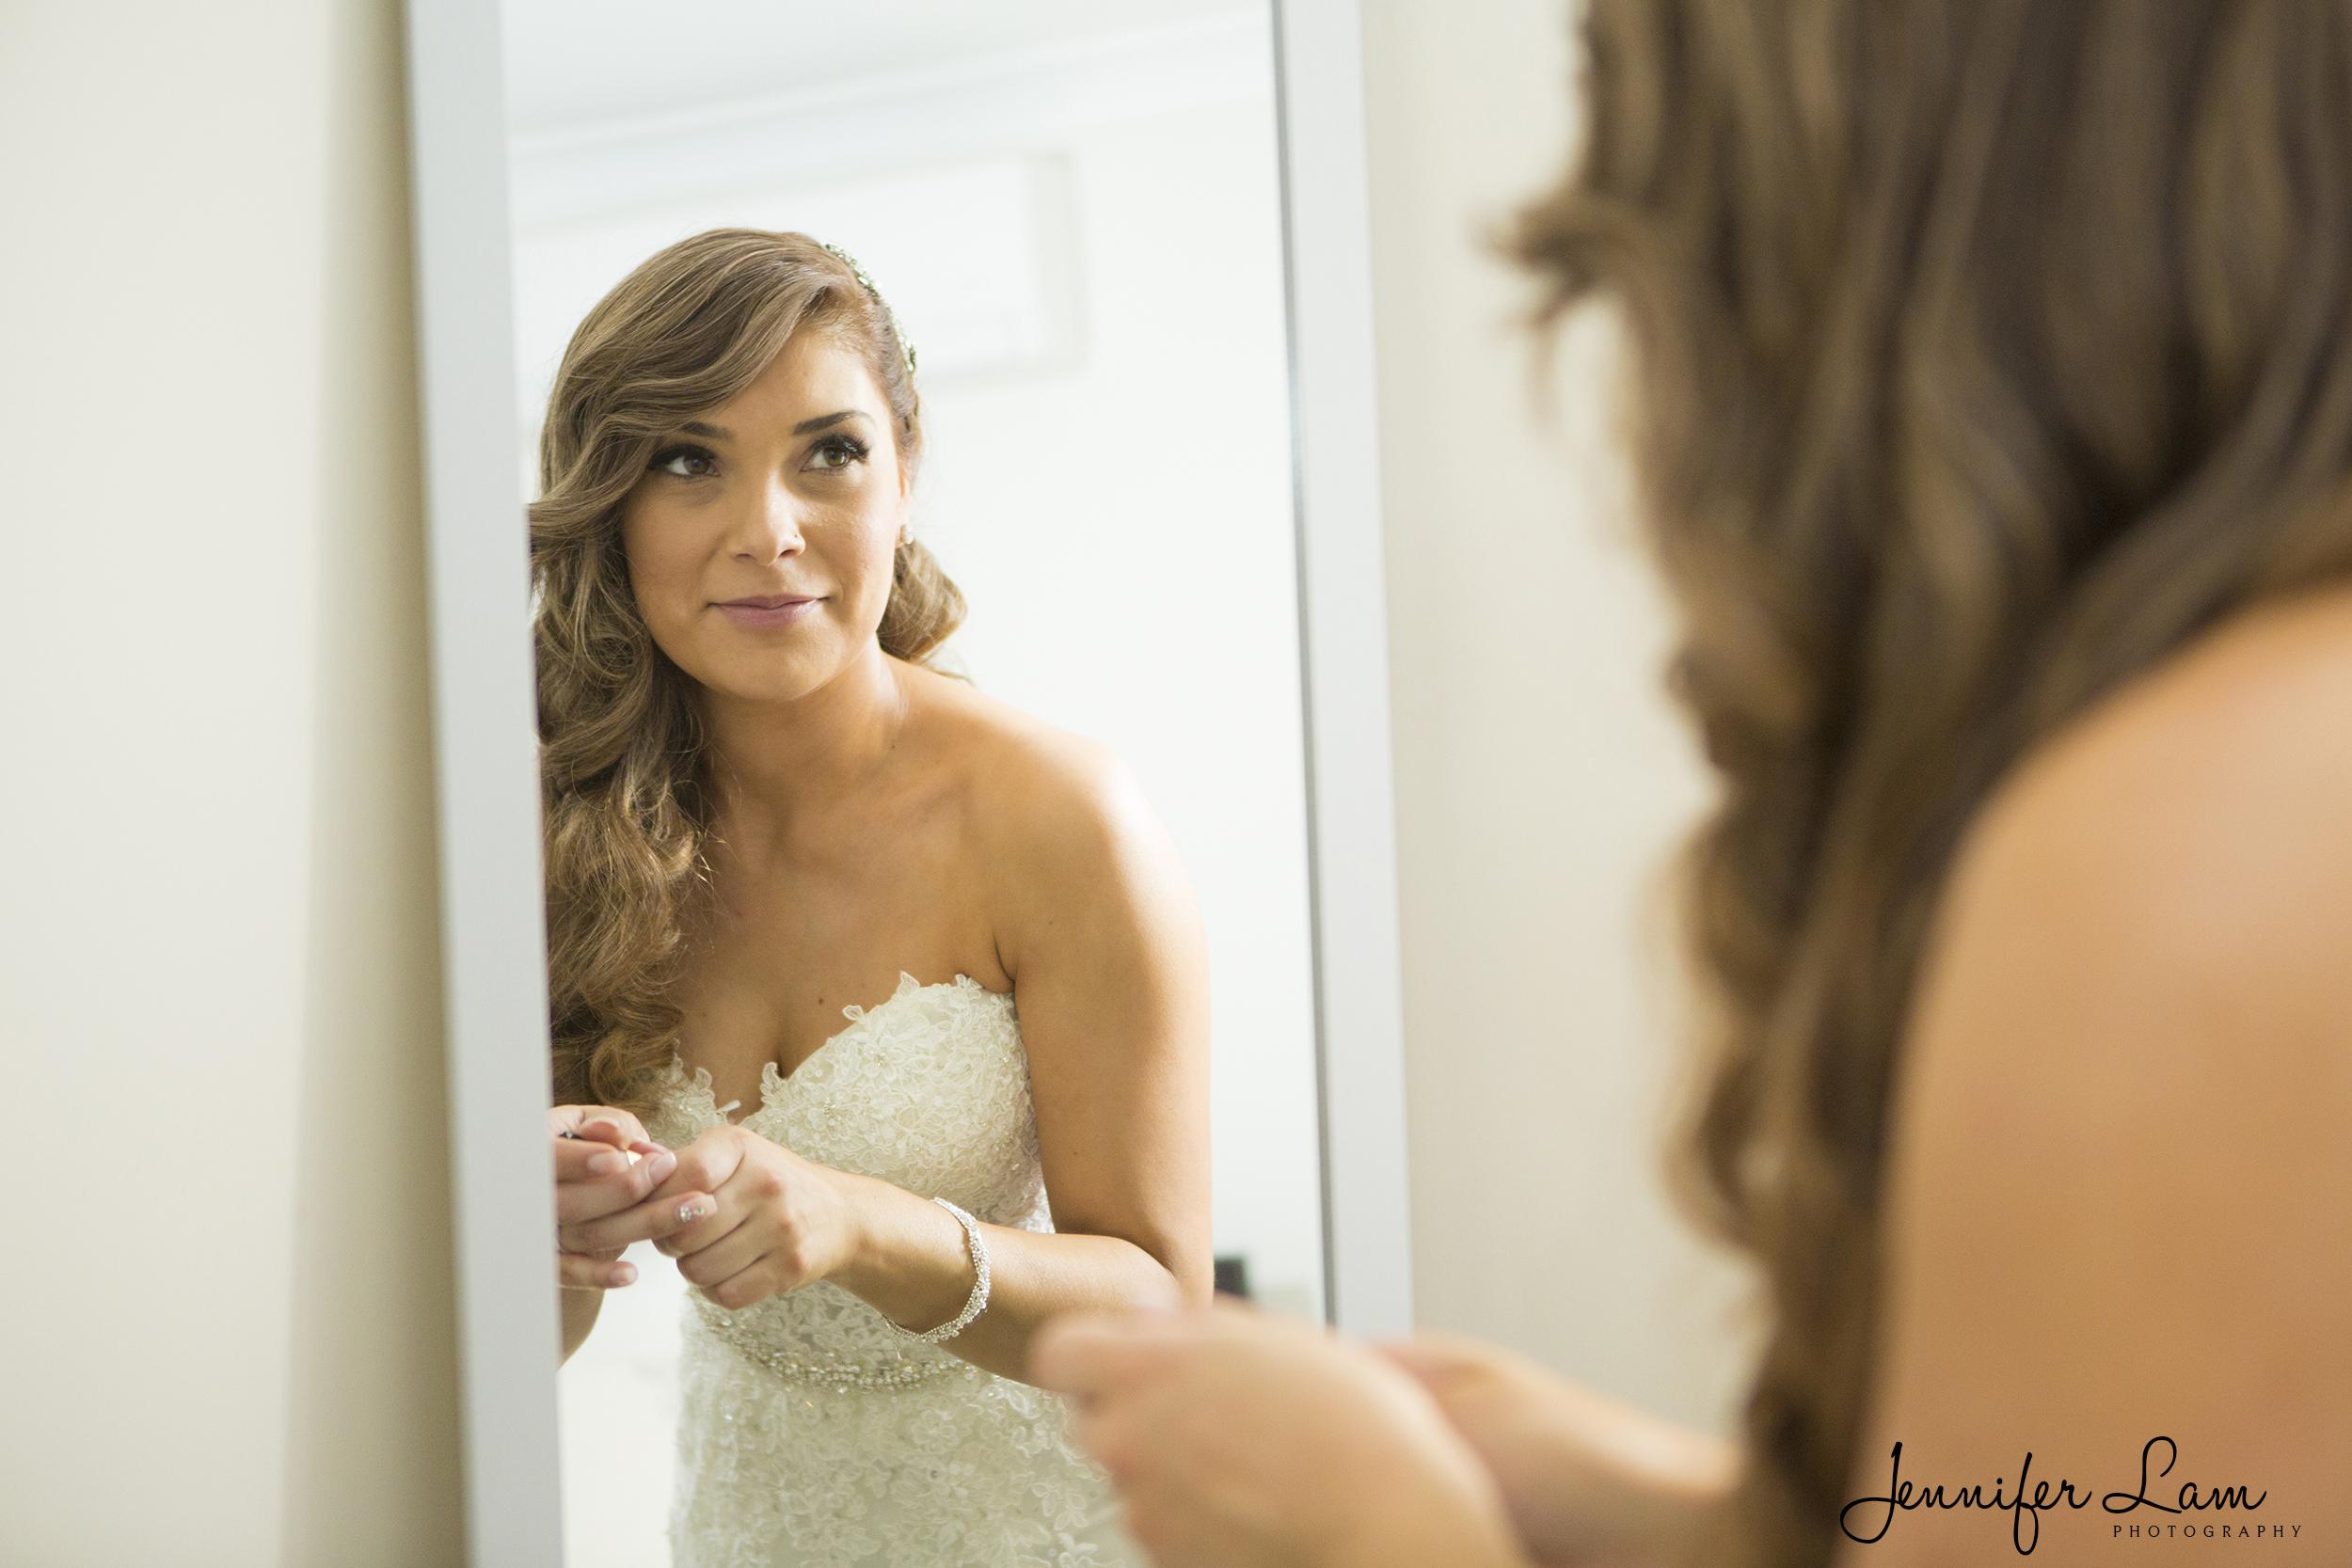 M+A - Jennifer Lam Photography (5).jpg